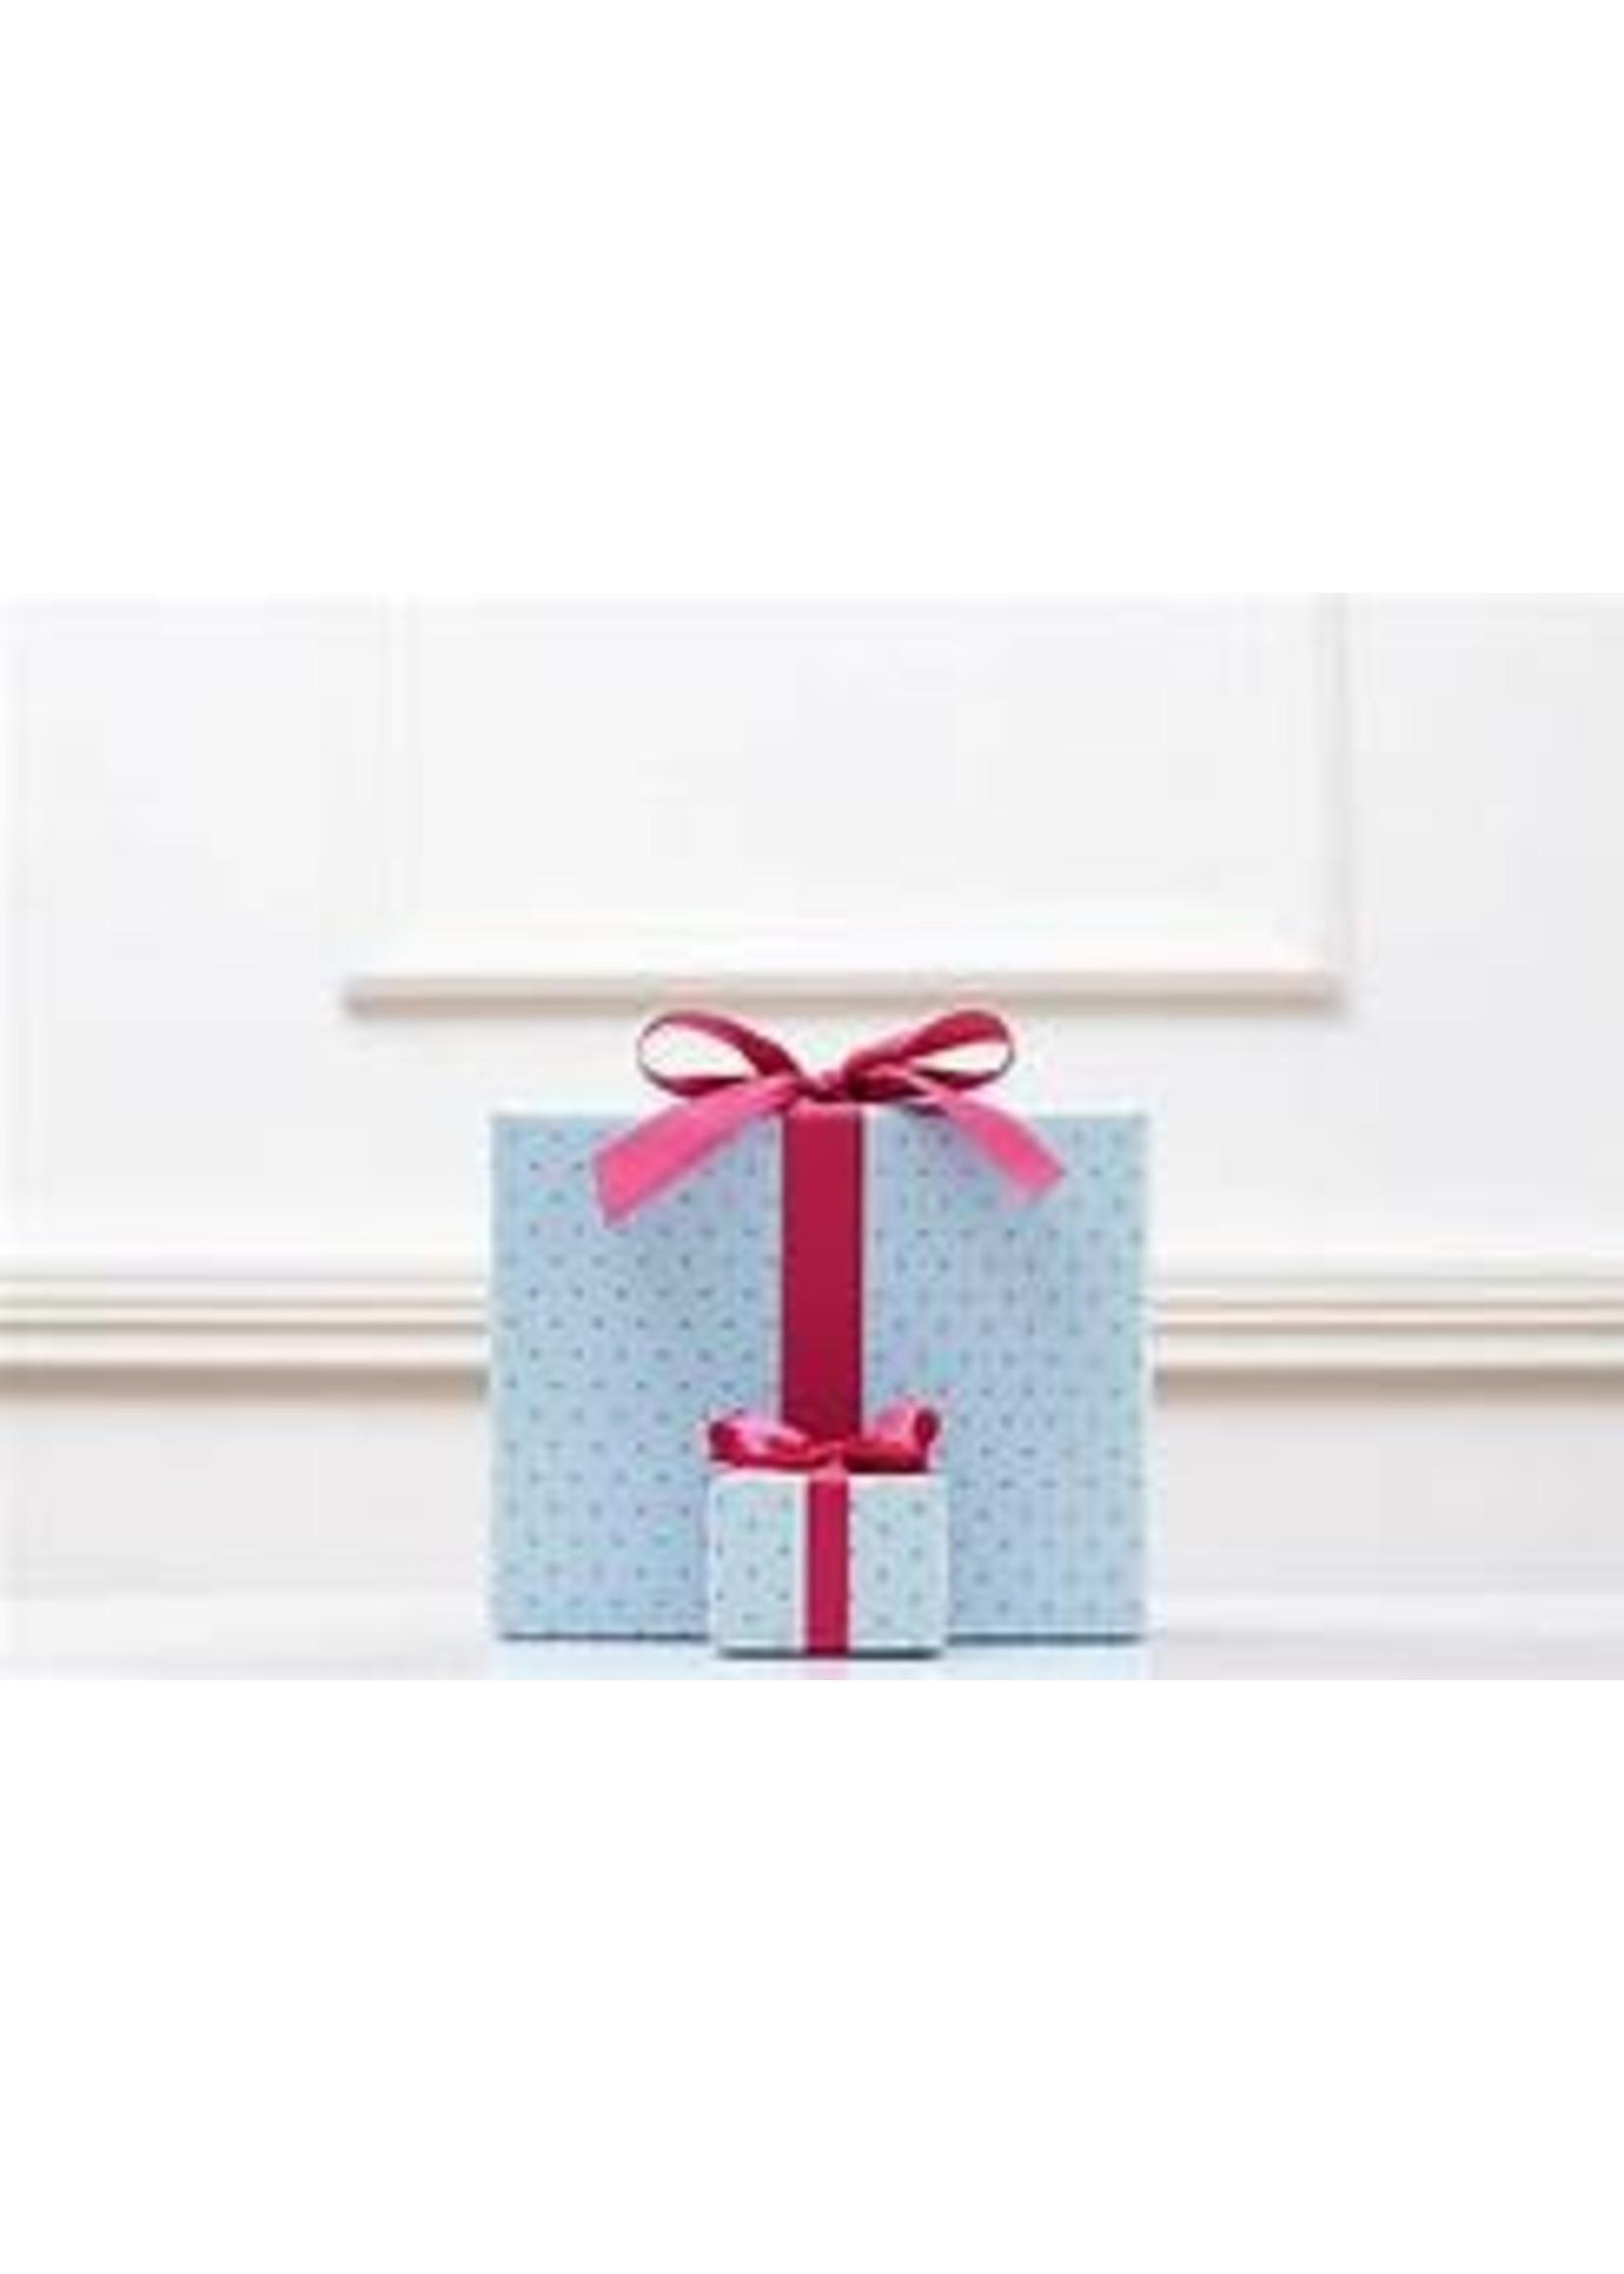 All Seasons Mini Subscription boxes